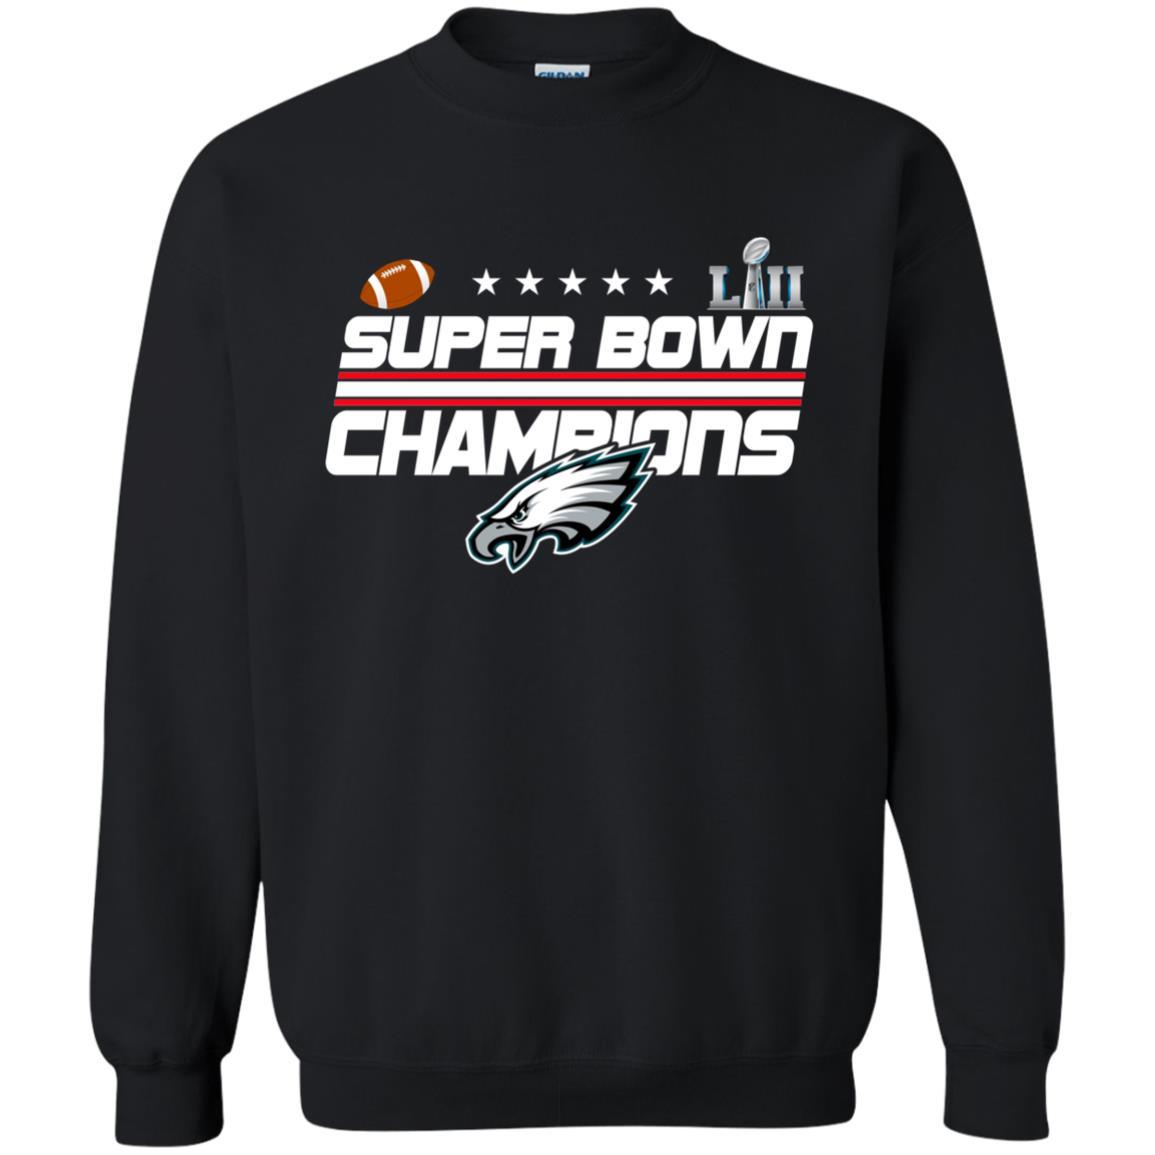 image 249 - Eagles Super Bowl Champions Shirt, Hoodie, Sweatshirt